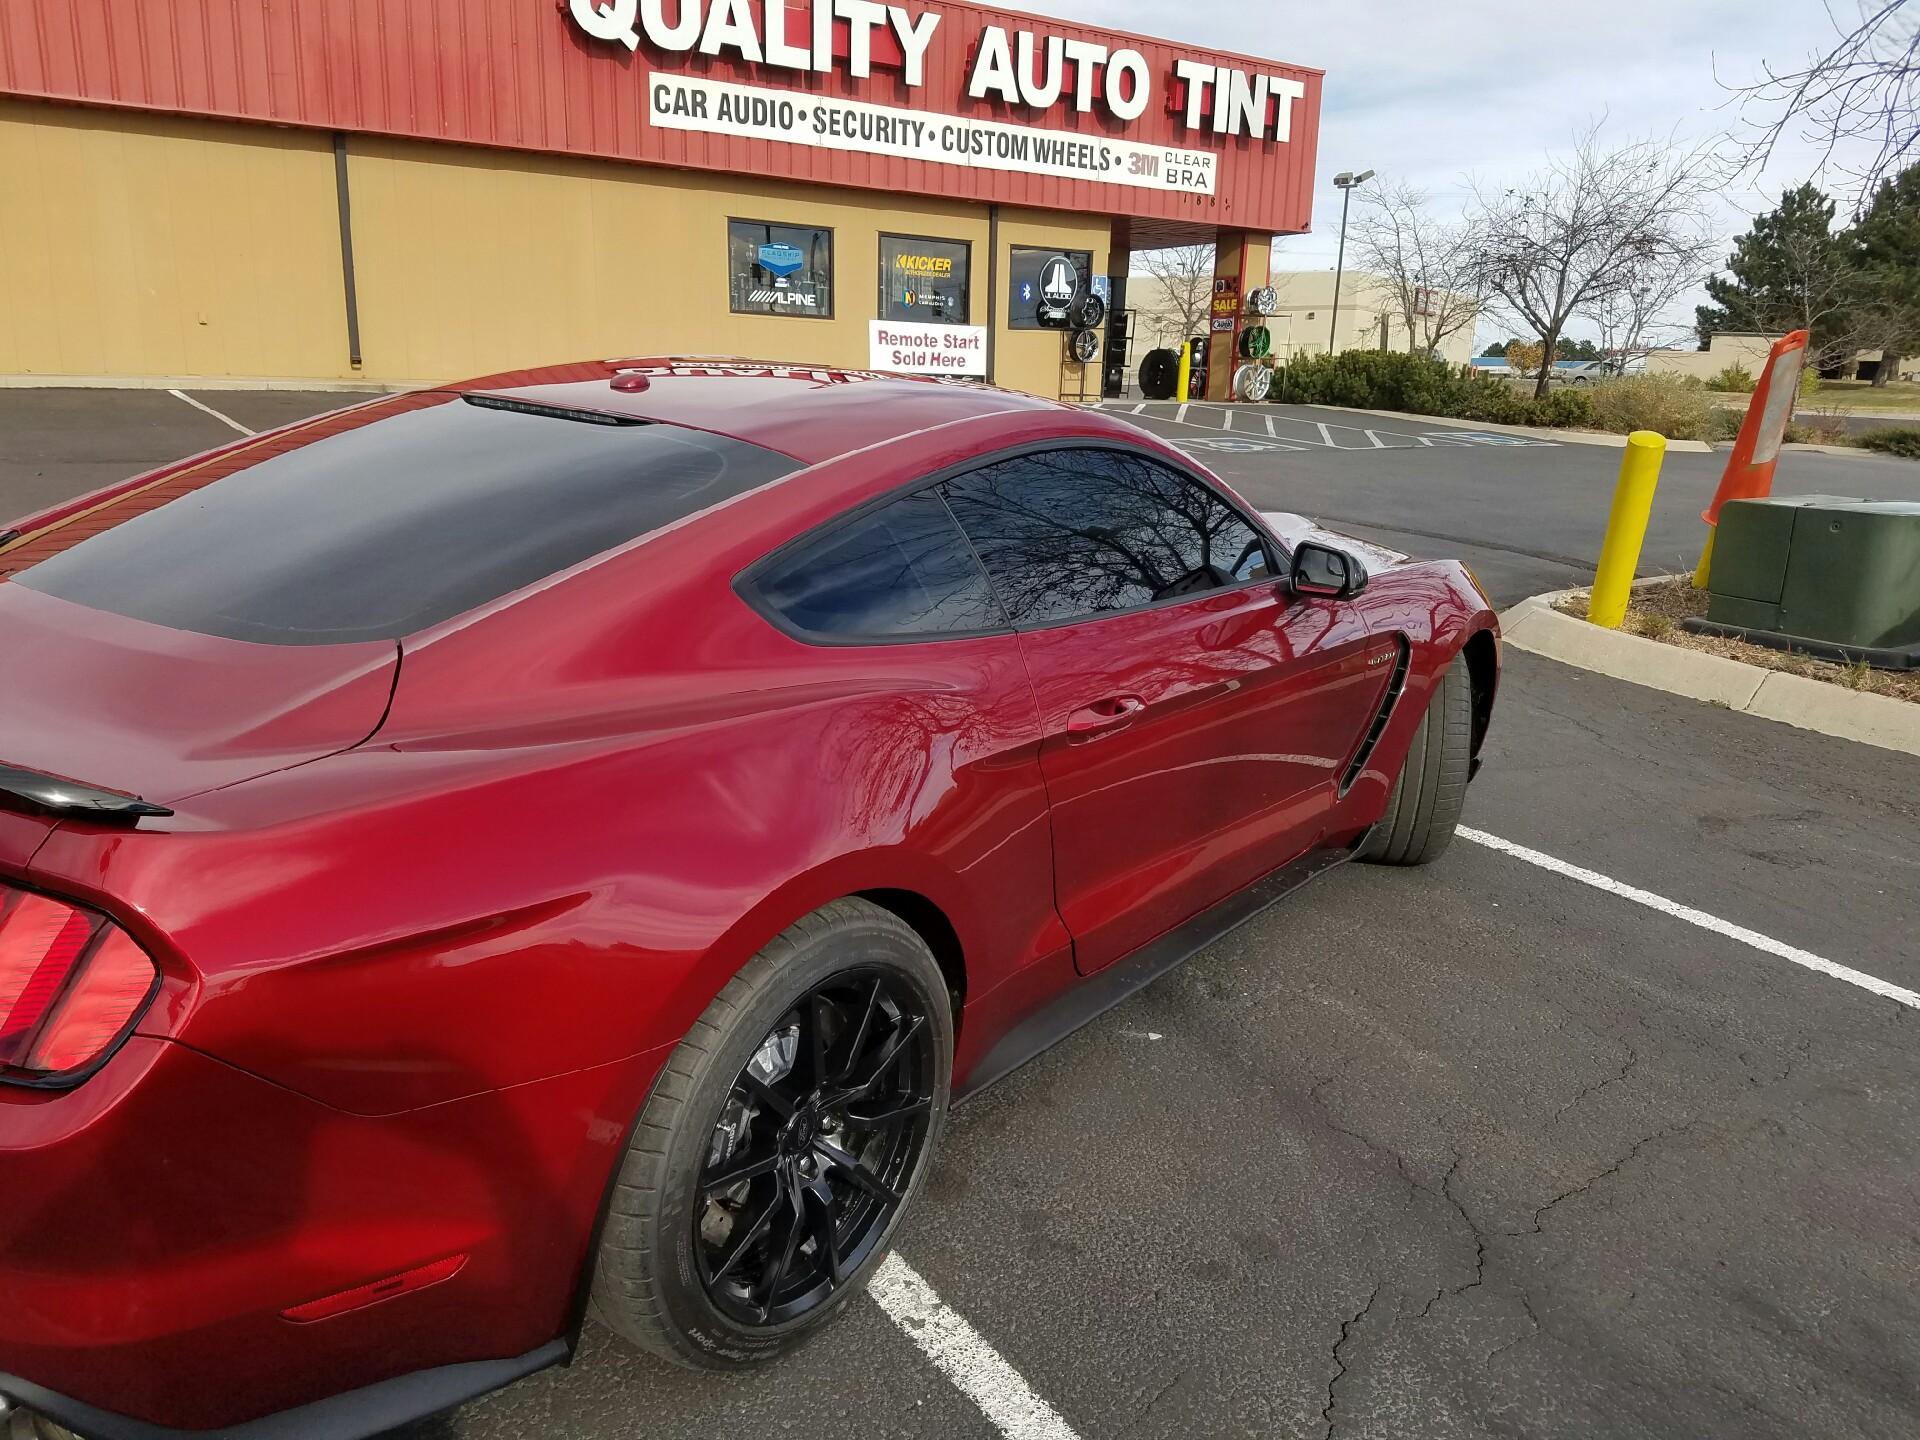 Quality Auto Performance Center image 10